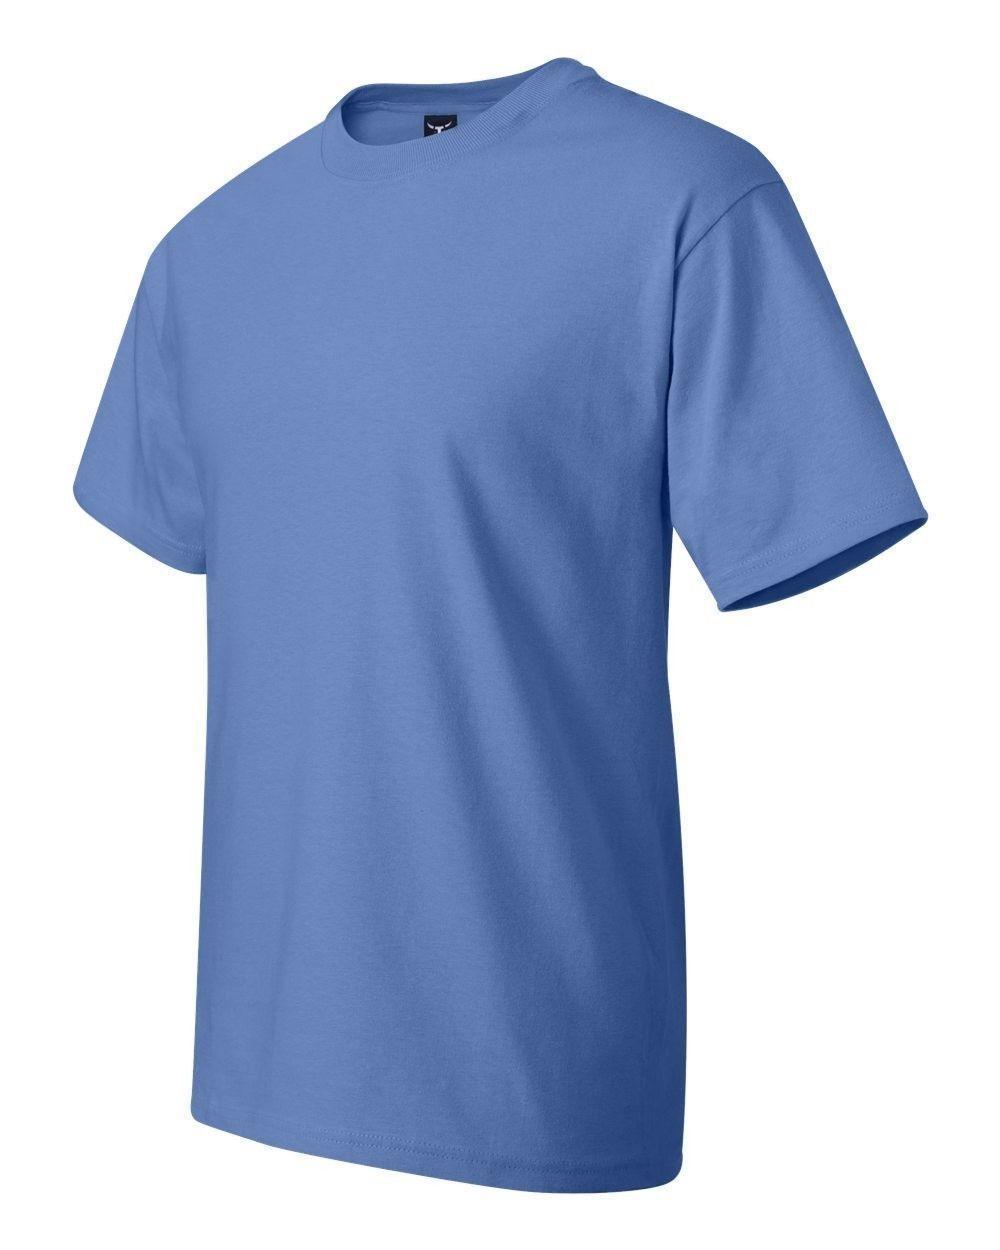 77df0ed9 Beefy T Tee Shirts - DREAMWORKS